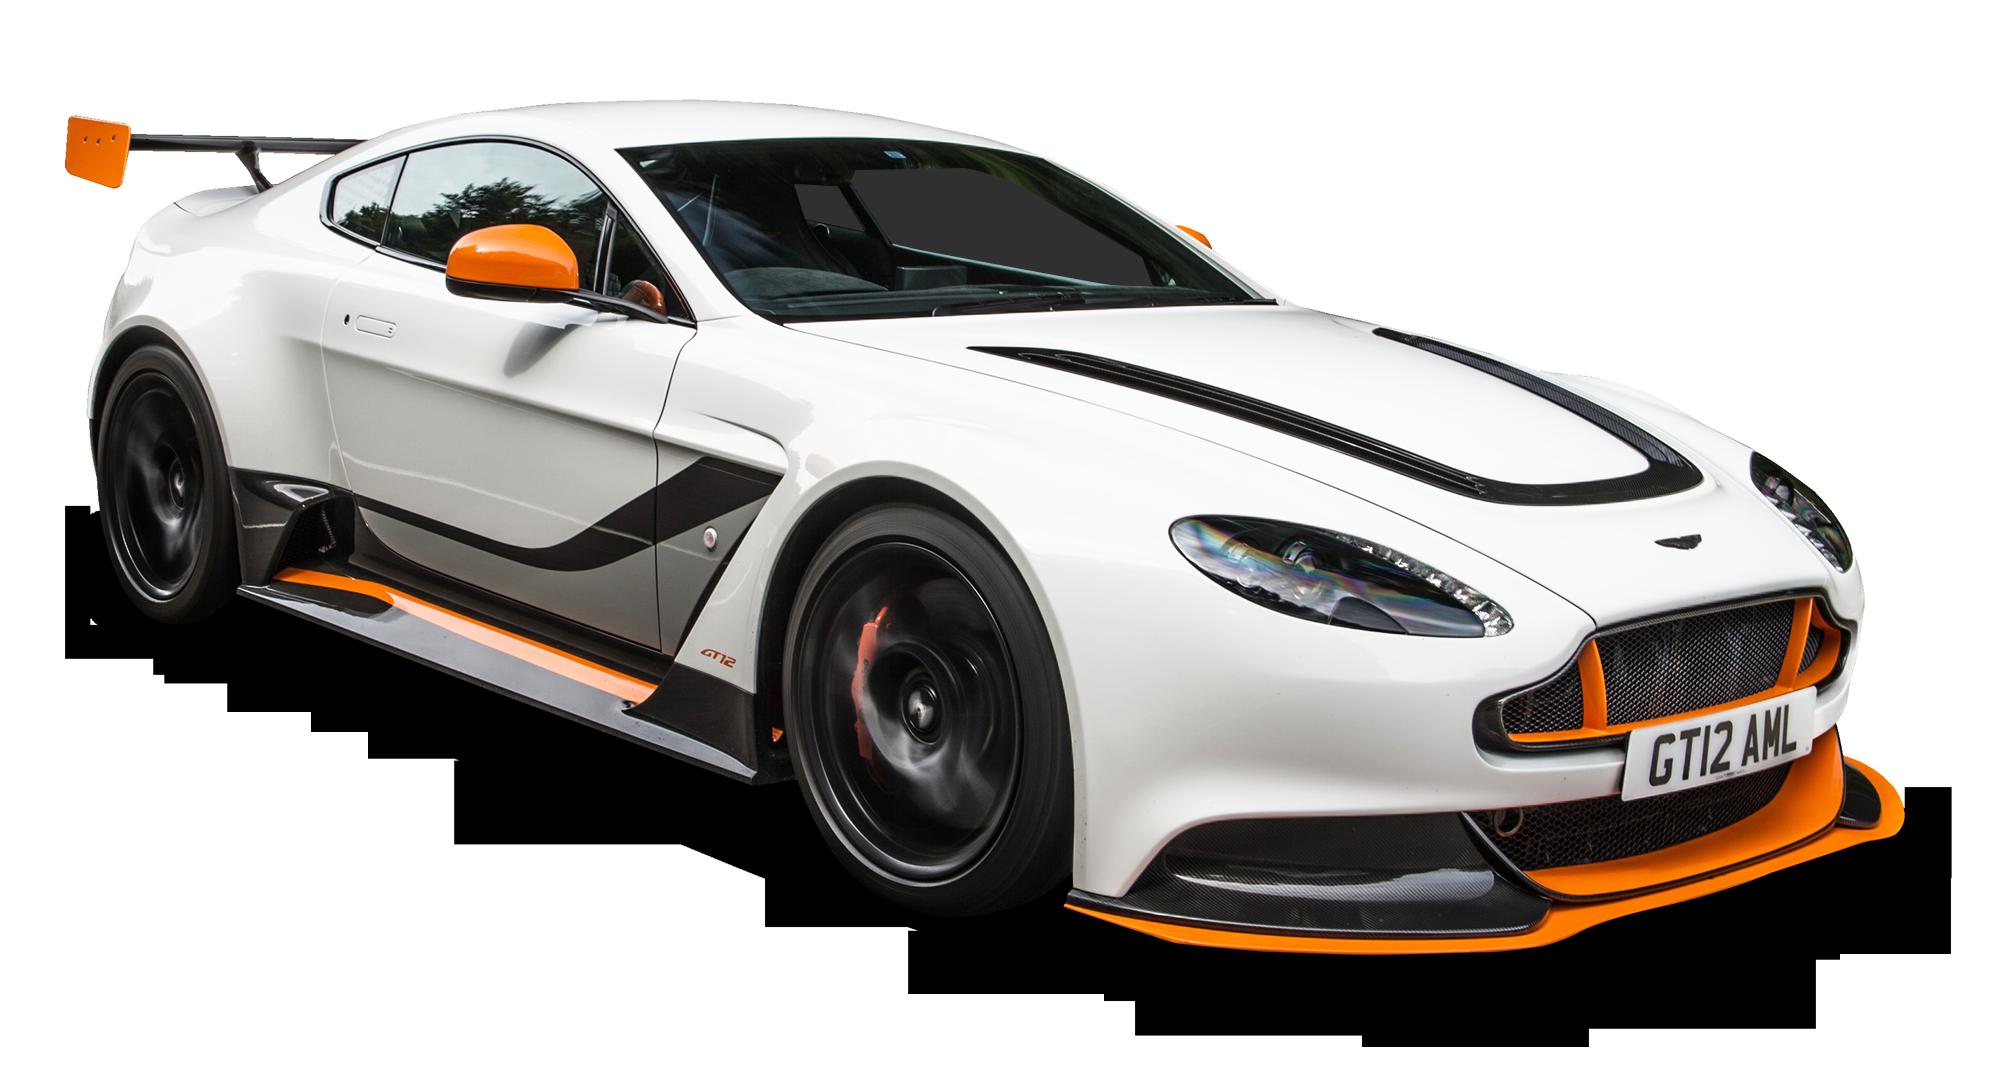 Aston Martin Vantage White Car PNG Image.